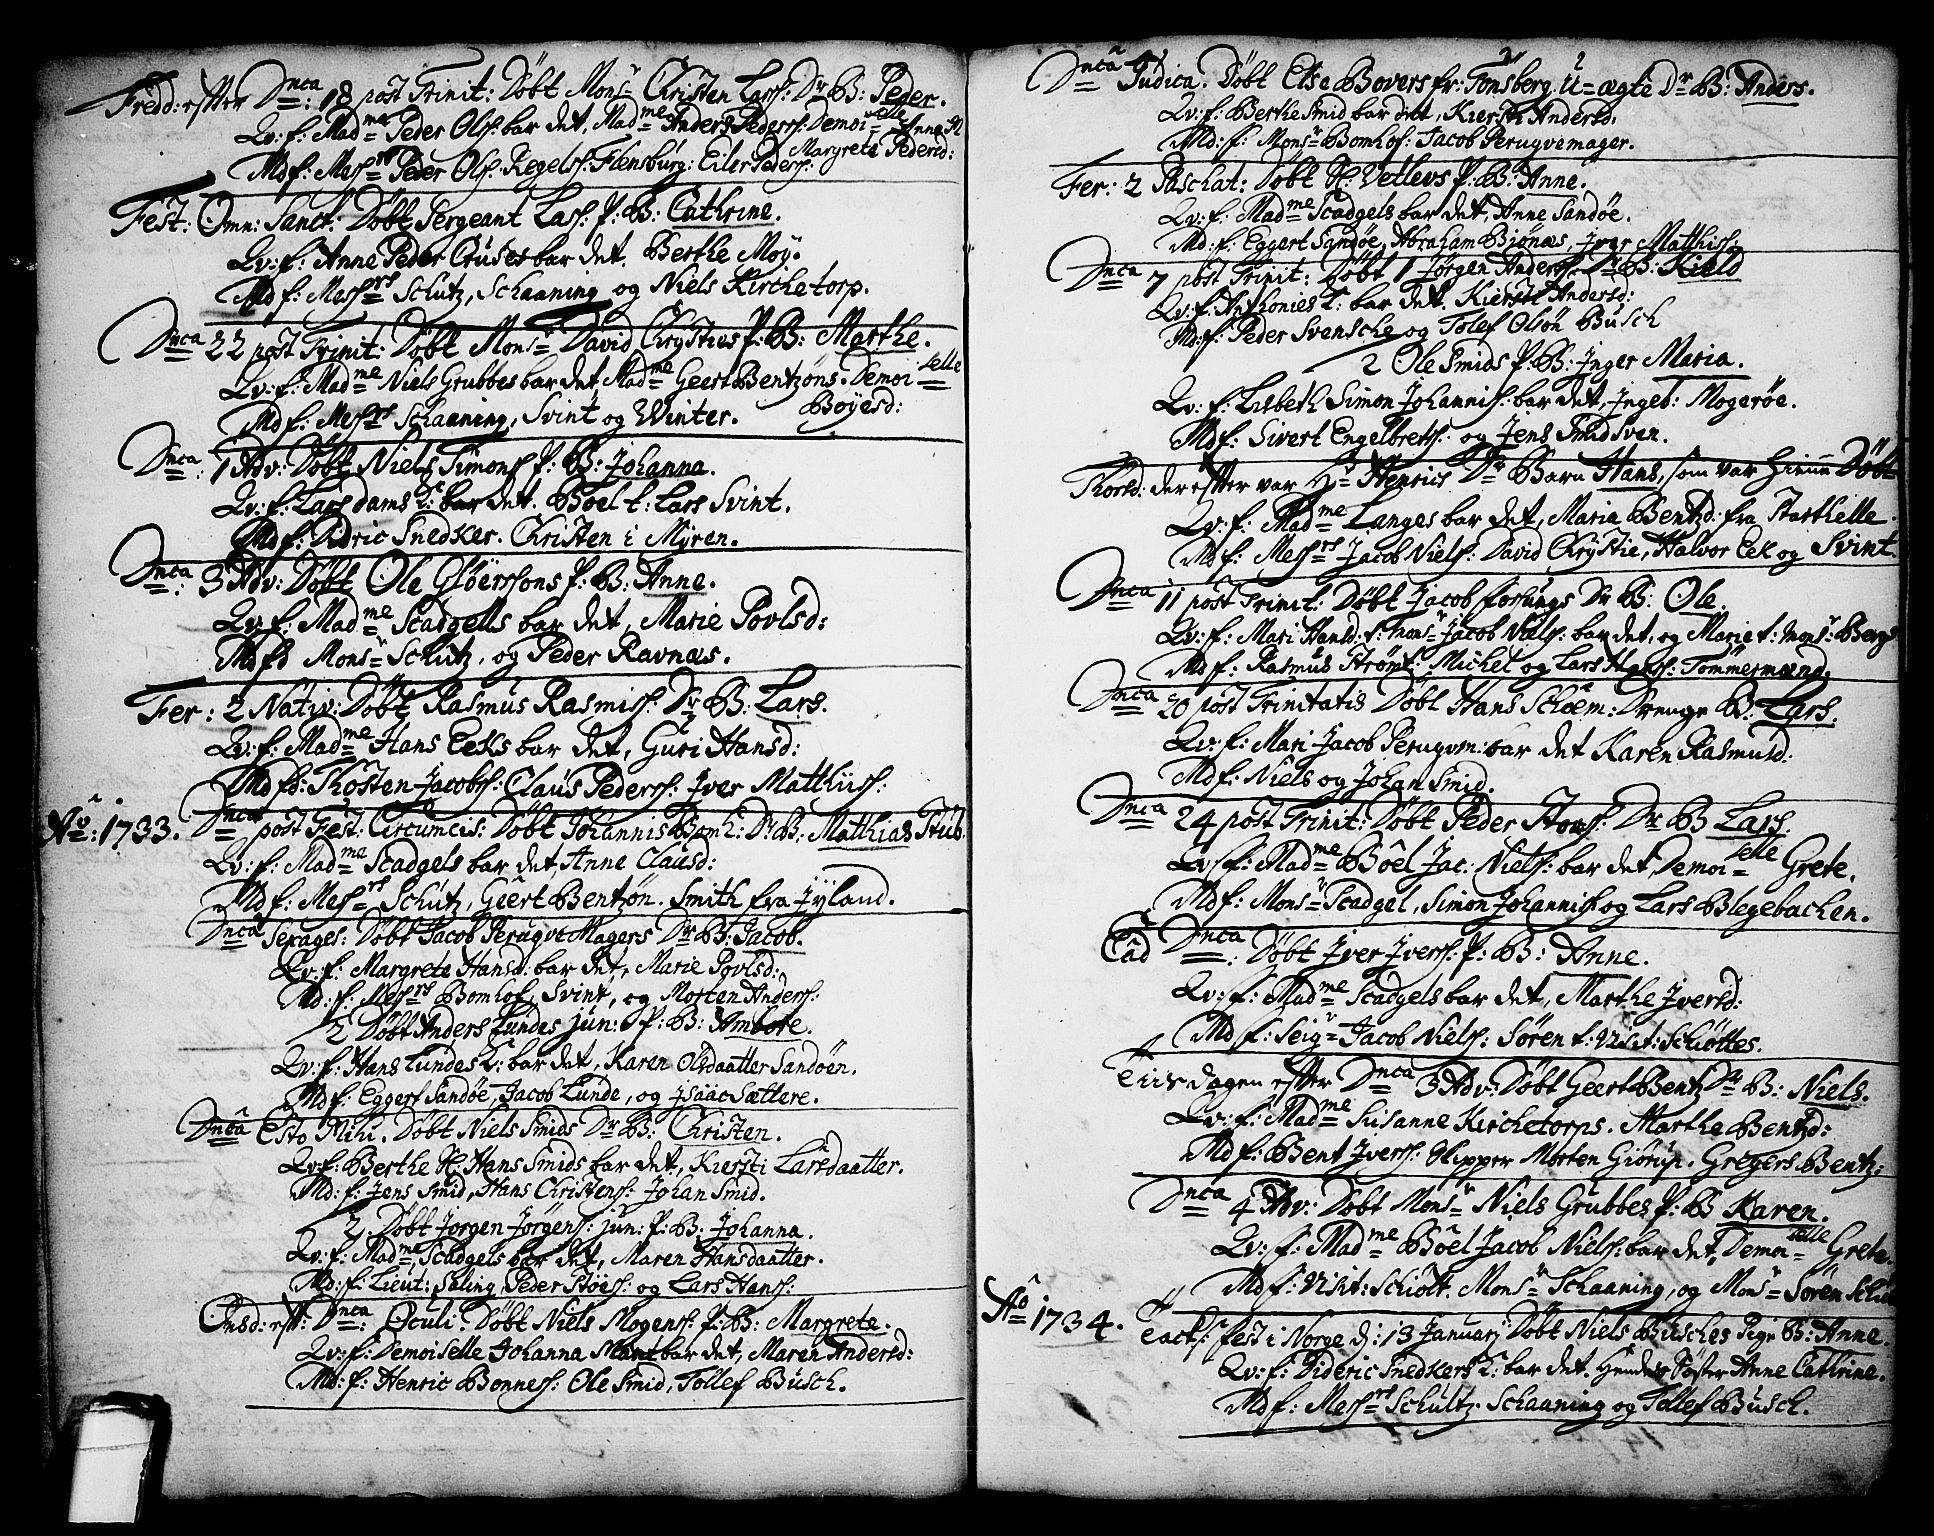 SAKO, Brevik kirkebøker, F/Fa/L0002: Ministerialbok nr. 2, 1720-1764, s. 34d